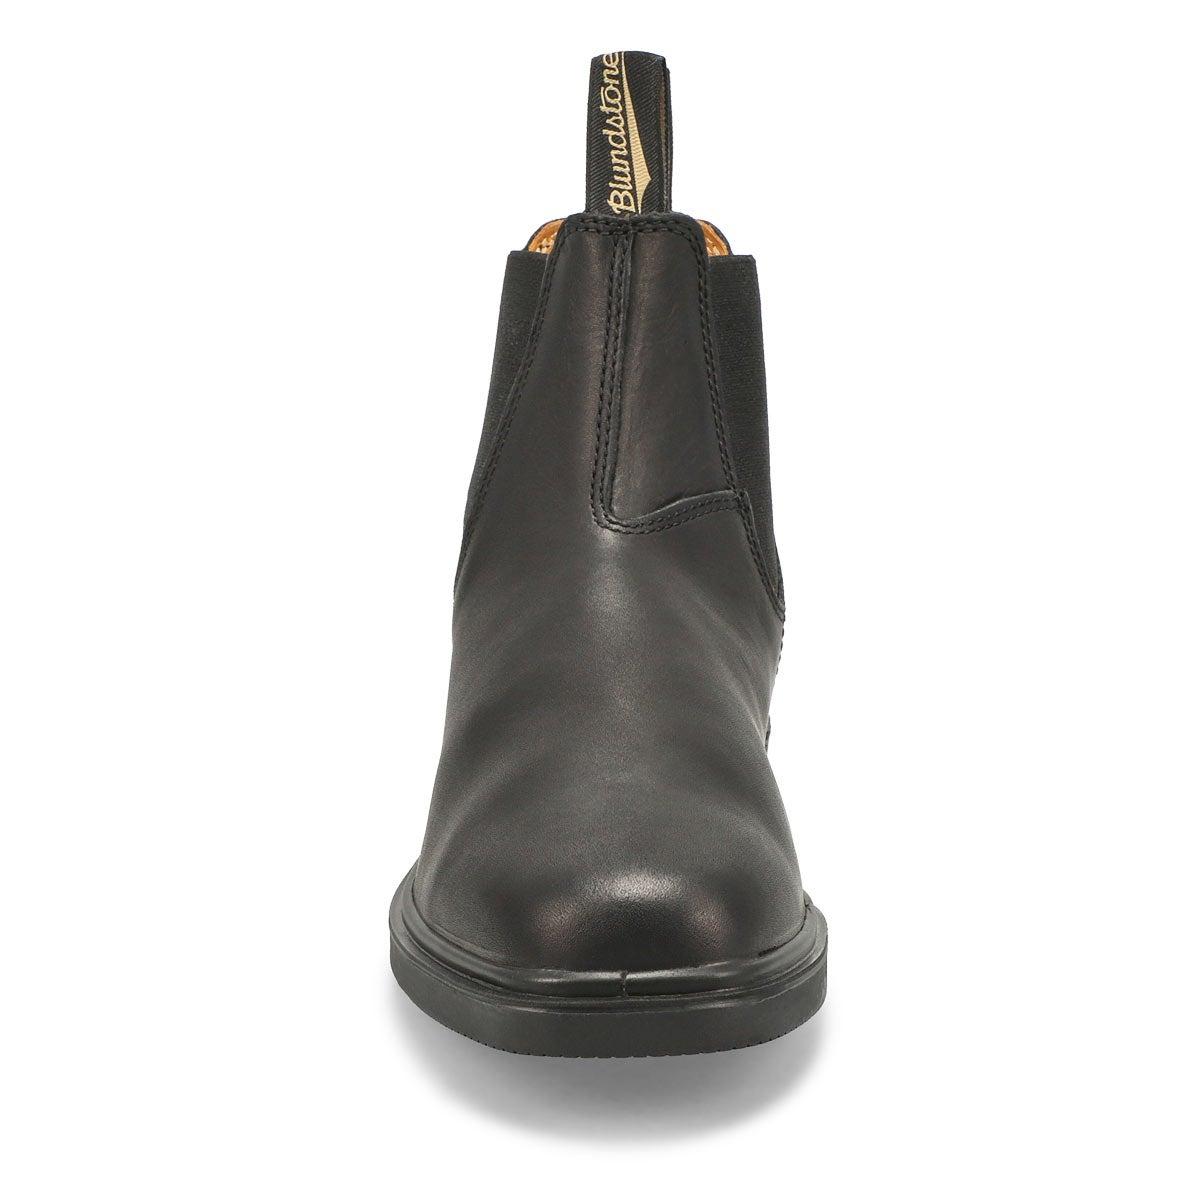 Unisex Chistel Toe Boot - Black